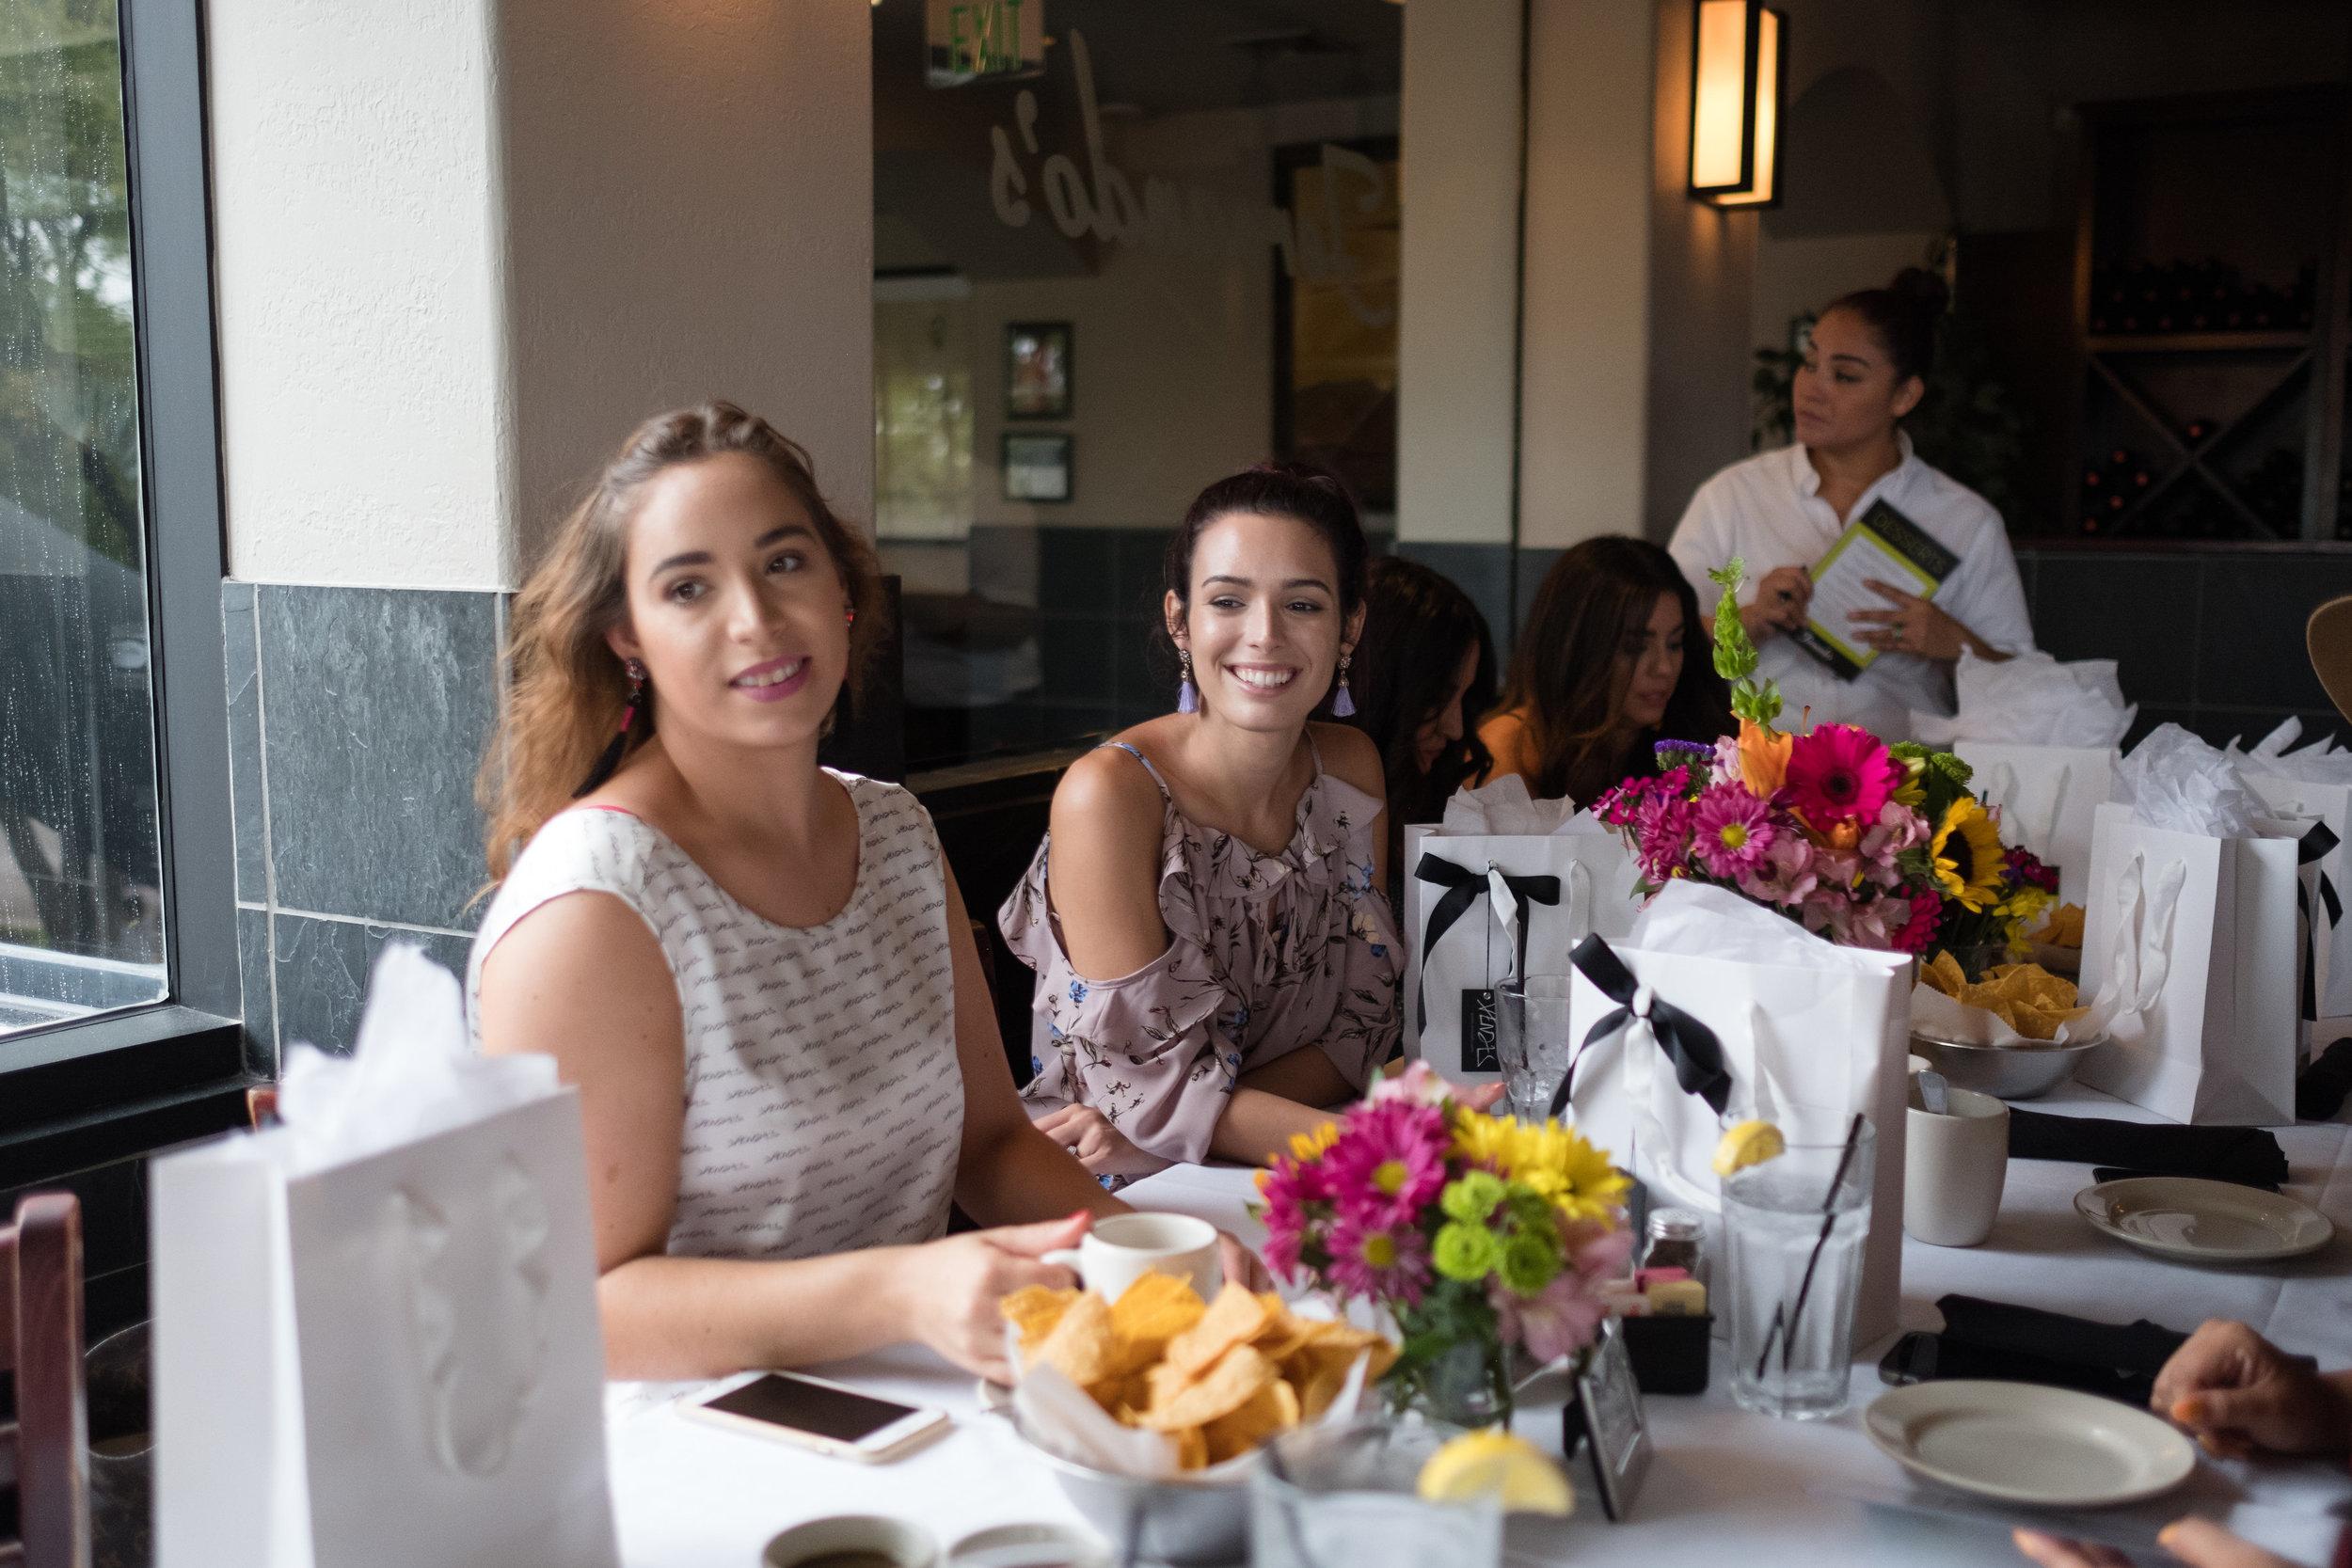 LatinaBloggerBrunch_0073.jpg